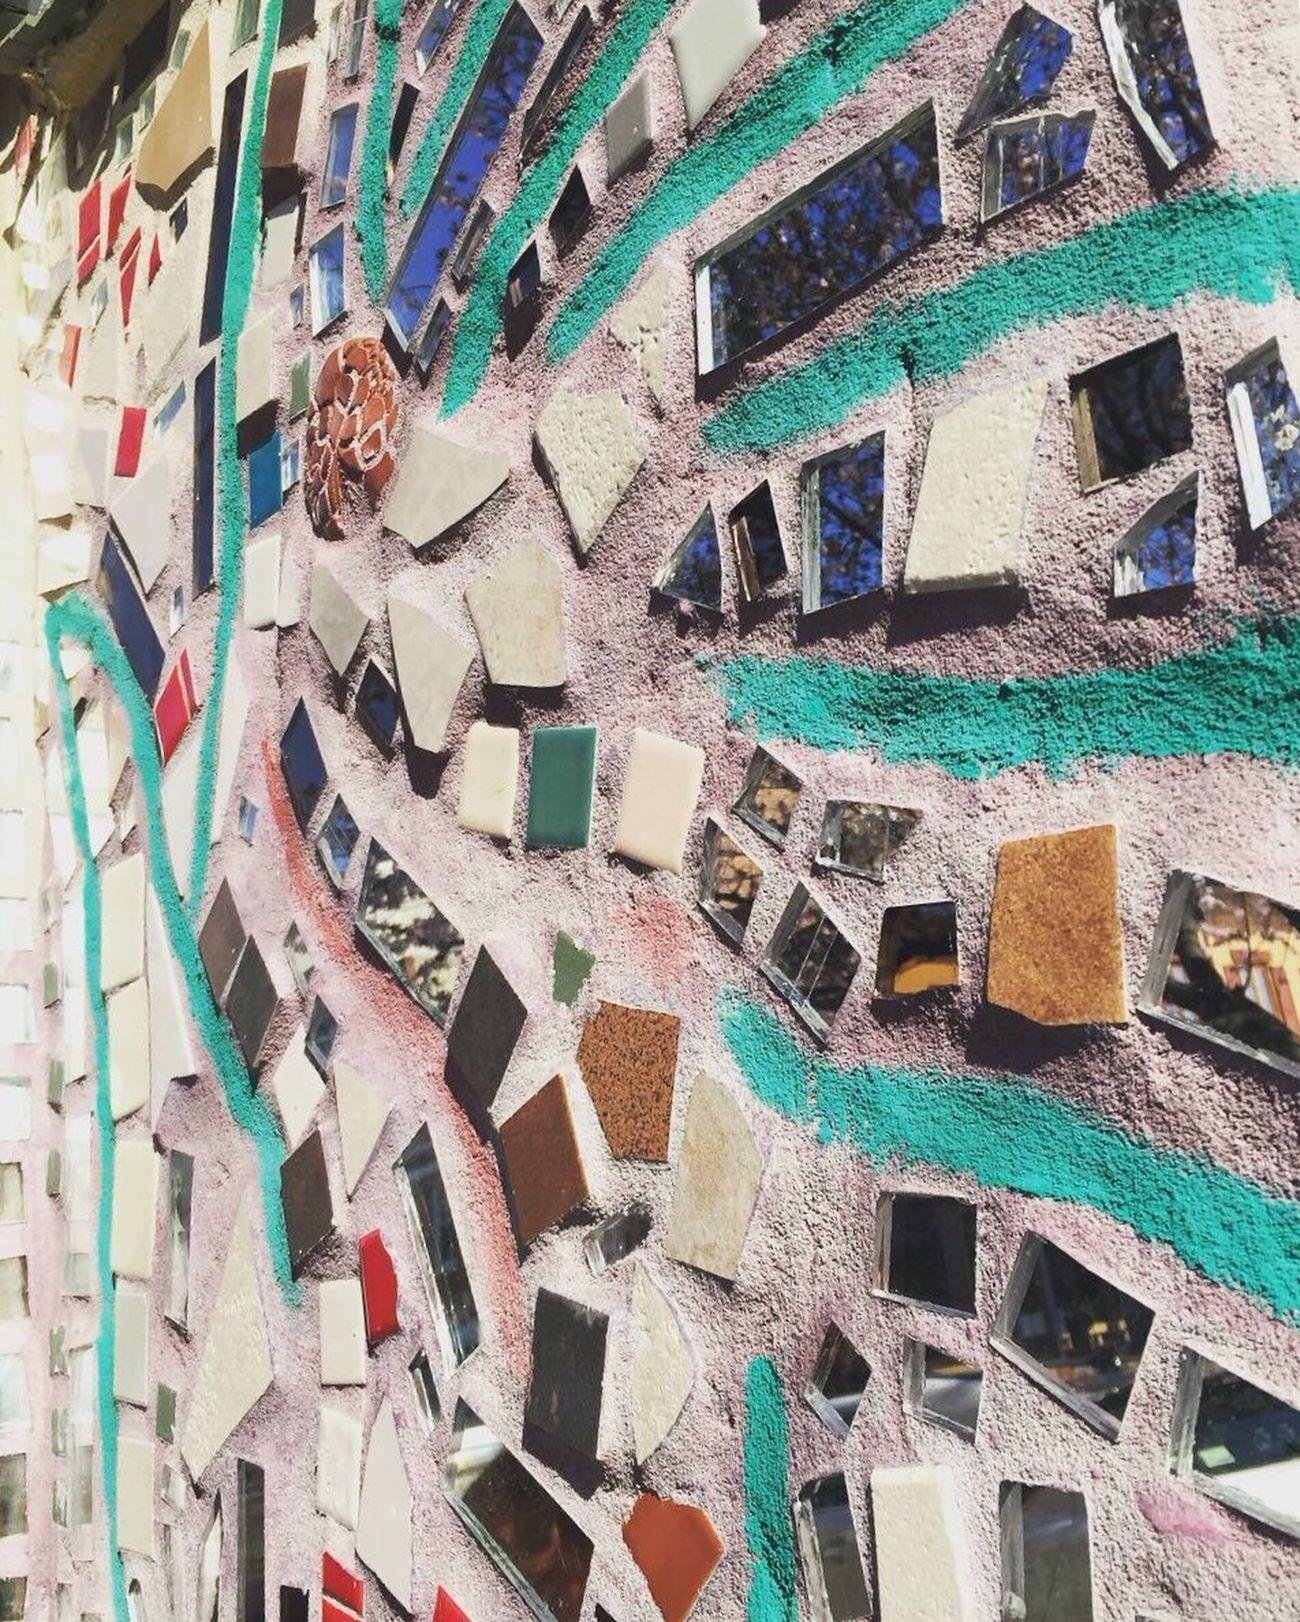 Mosaic Art Art Mosaic EyeEm Best Shots ATouristInMyOwnCity TheSidewalksOfTheCity ScenesFromTheStreet